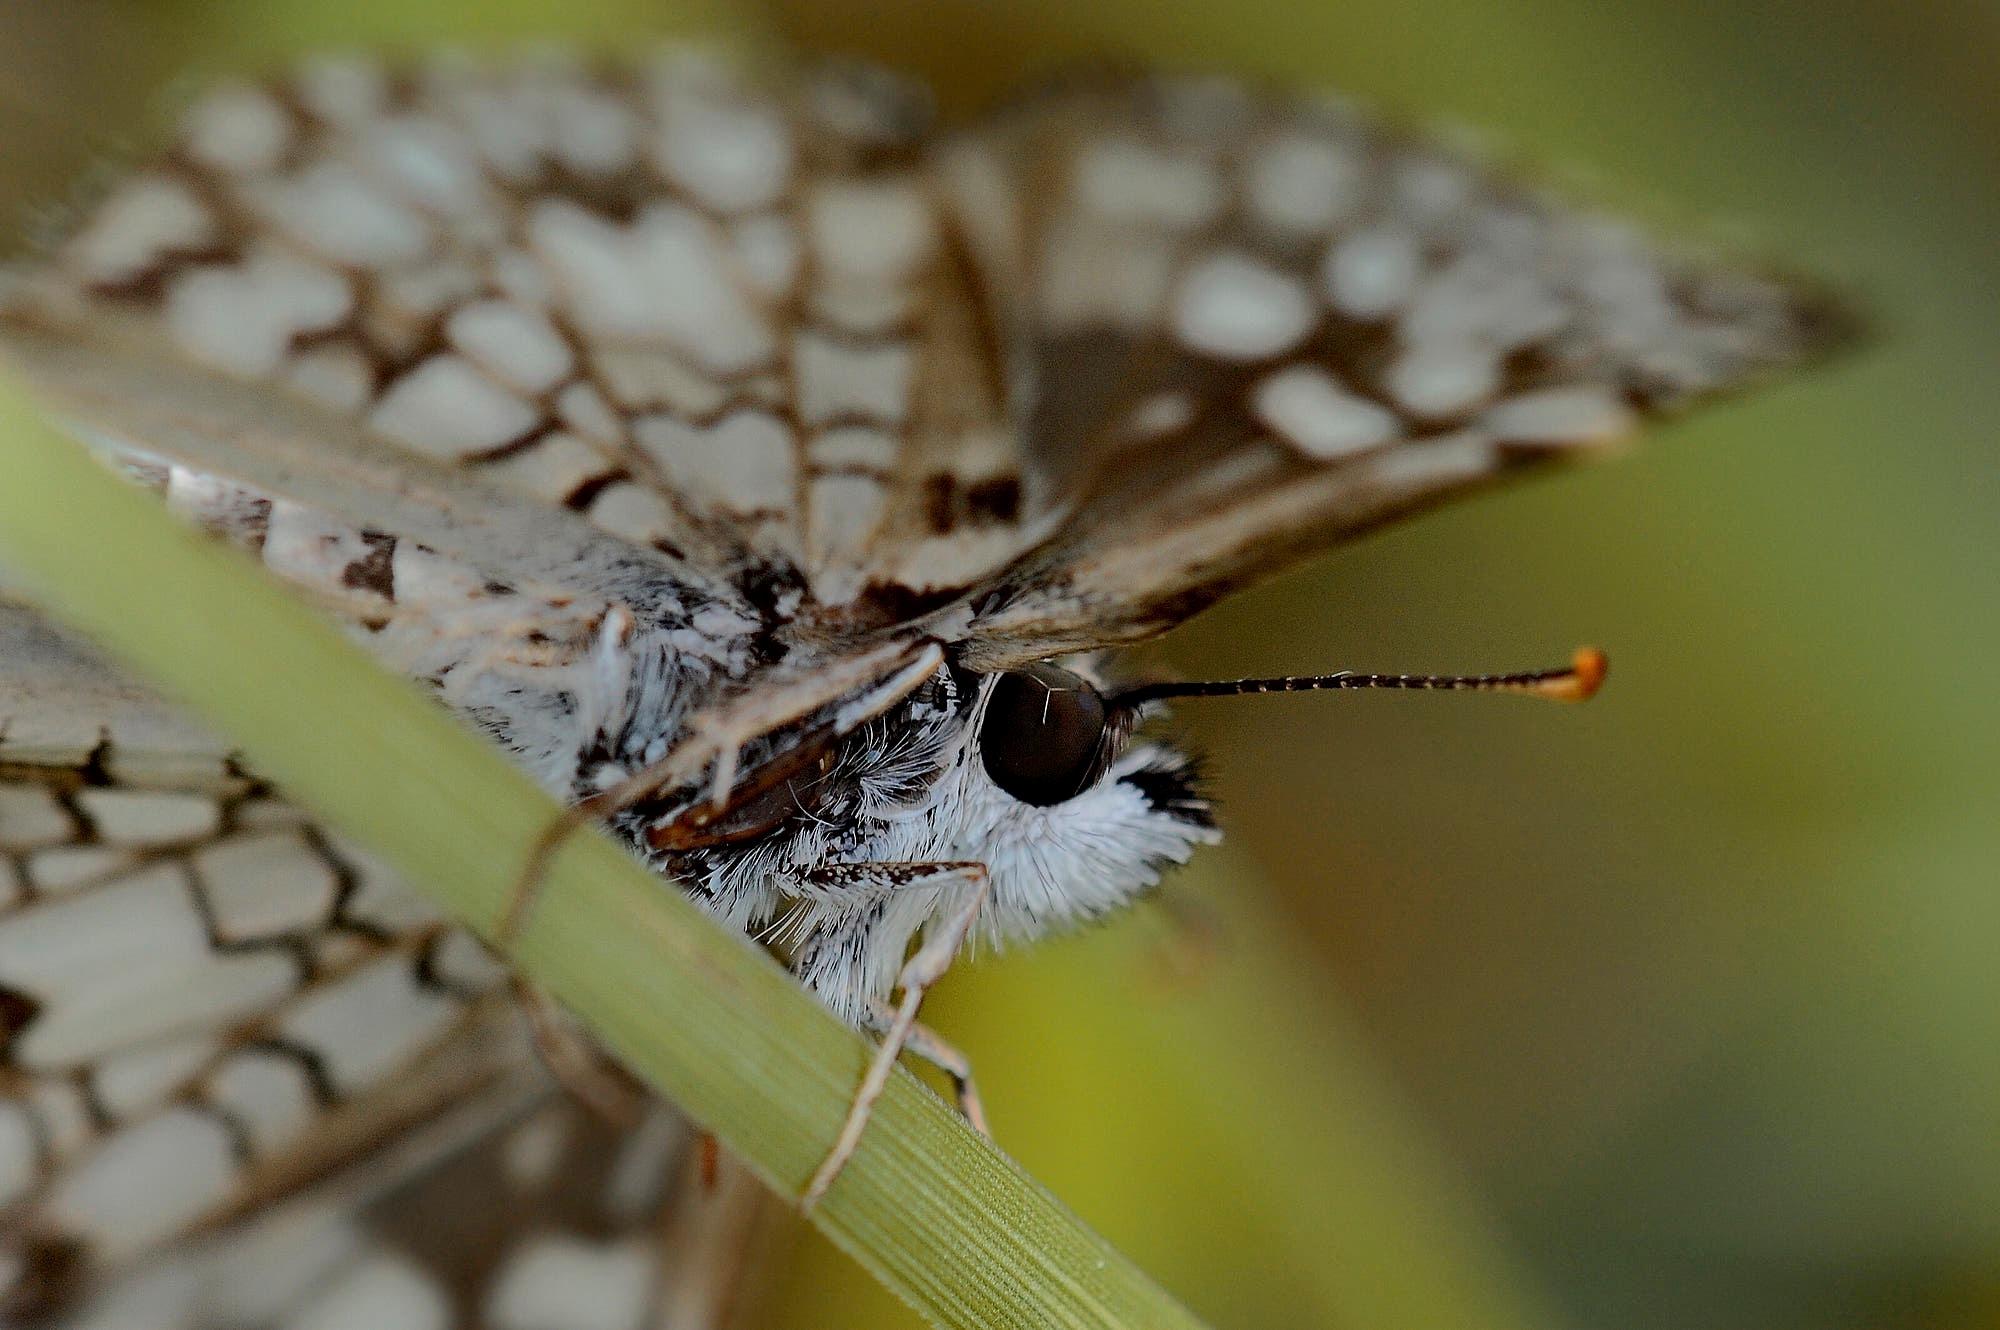 Buterfly in garden by sergiofernandes6767